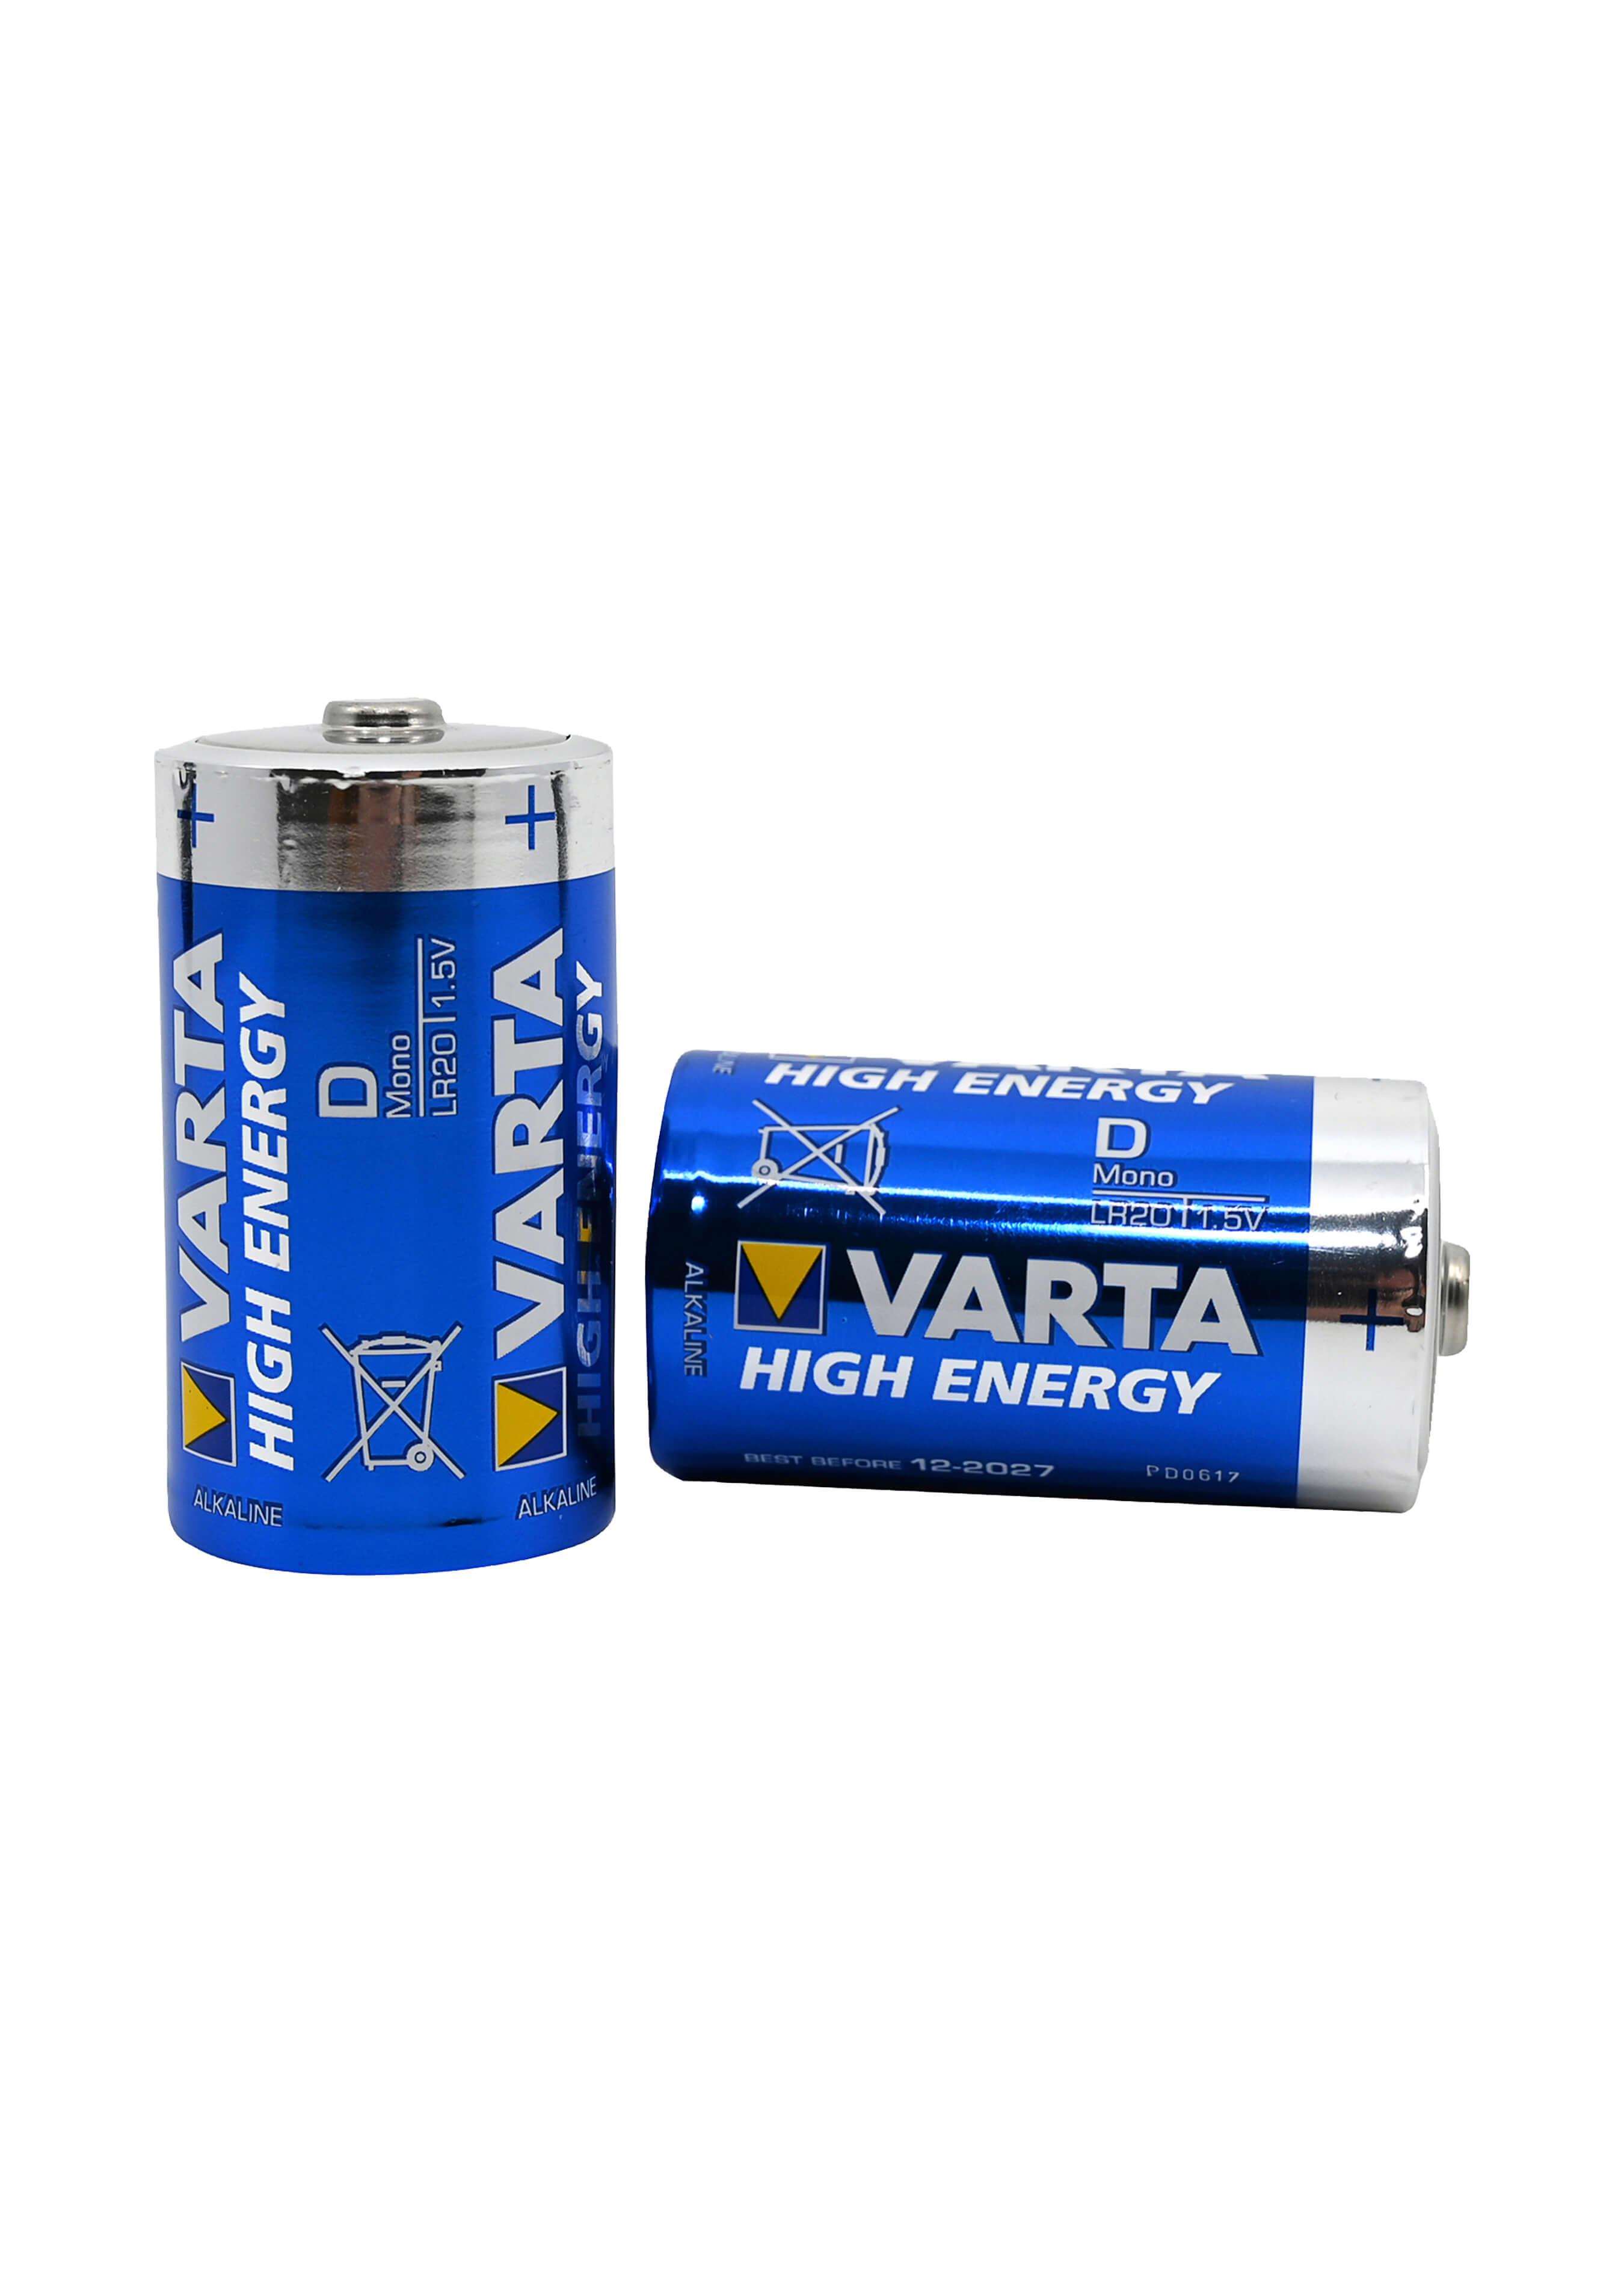 Varta 2 High Energy Batterien D / LR20 L3584 2